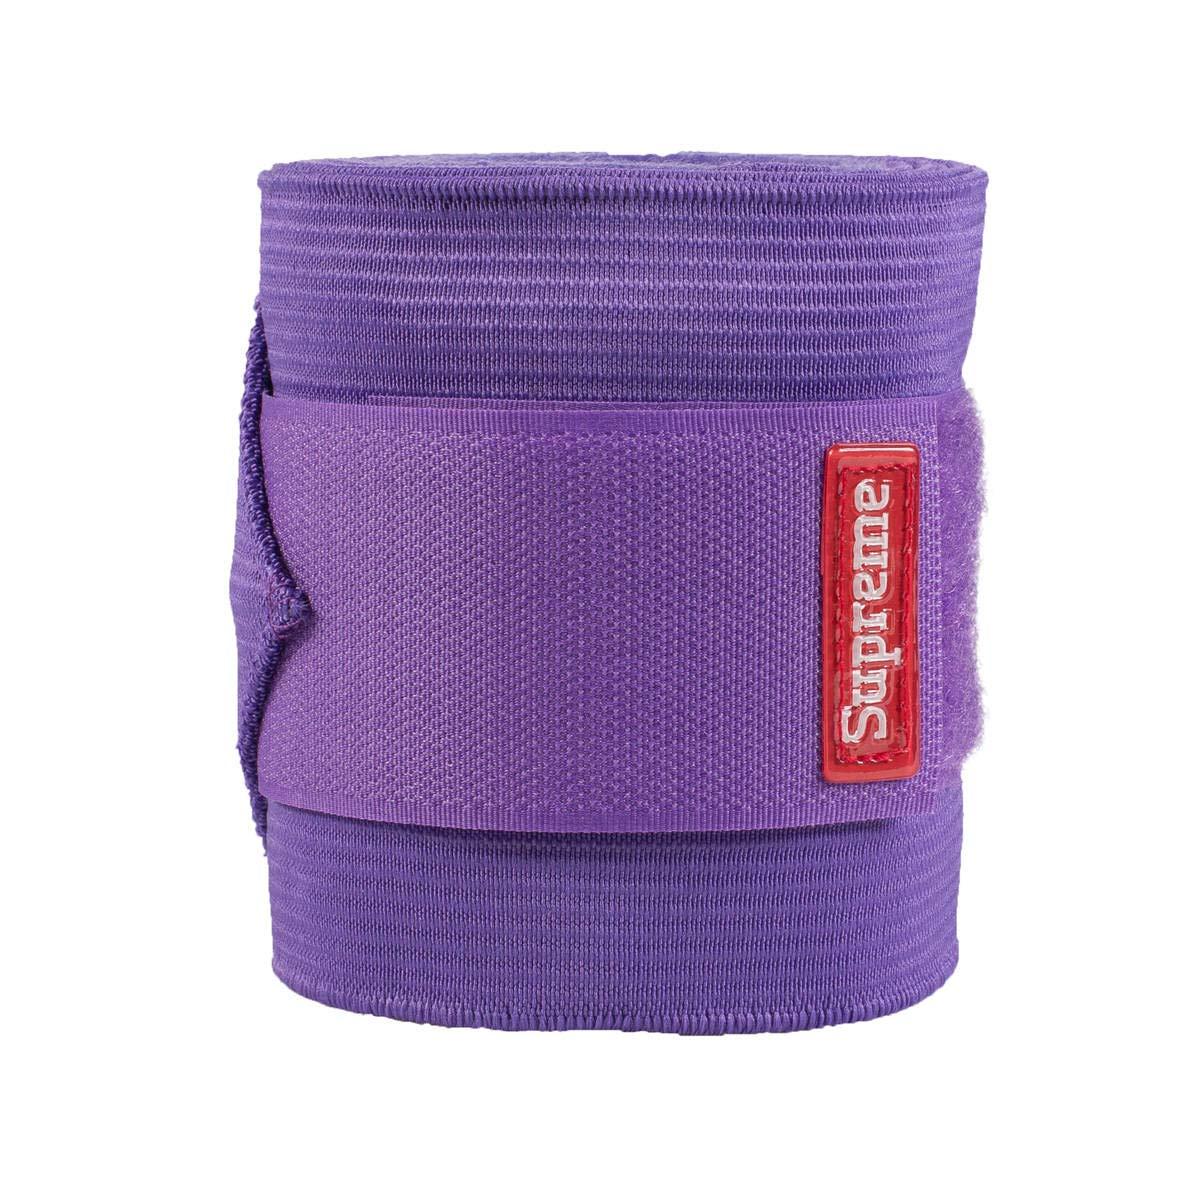 HORZE Fleece Elastic Combo Xtra Support Polo Wraps - Purple by HORZE